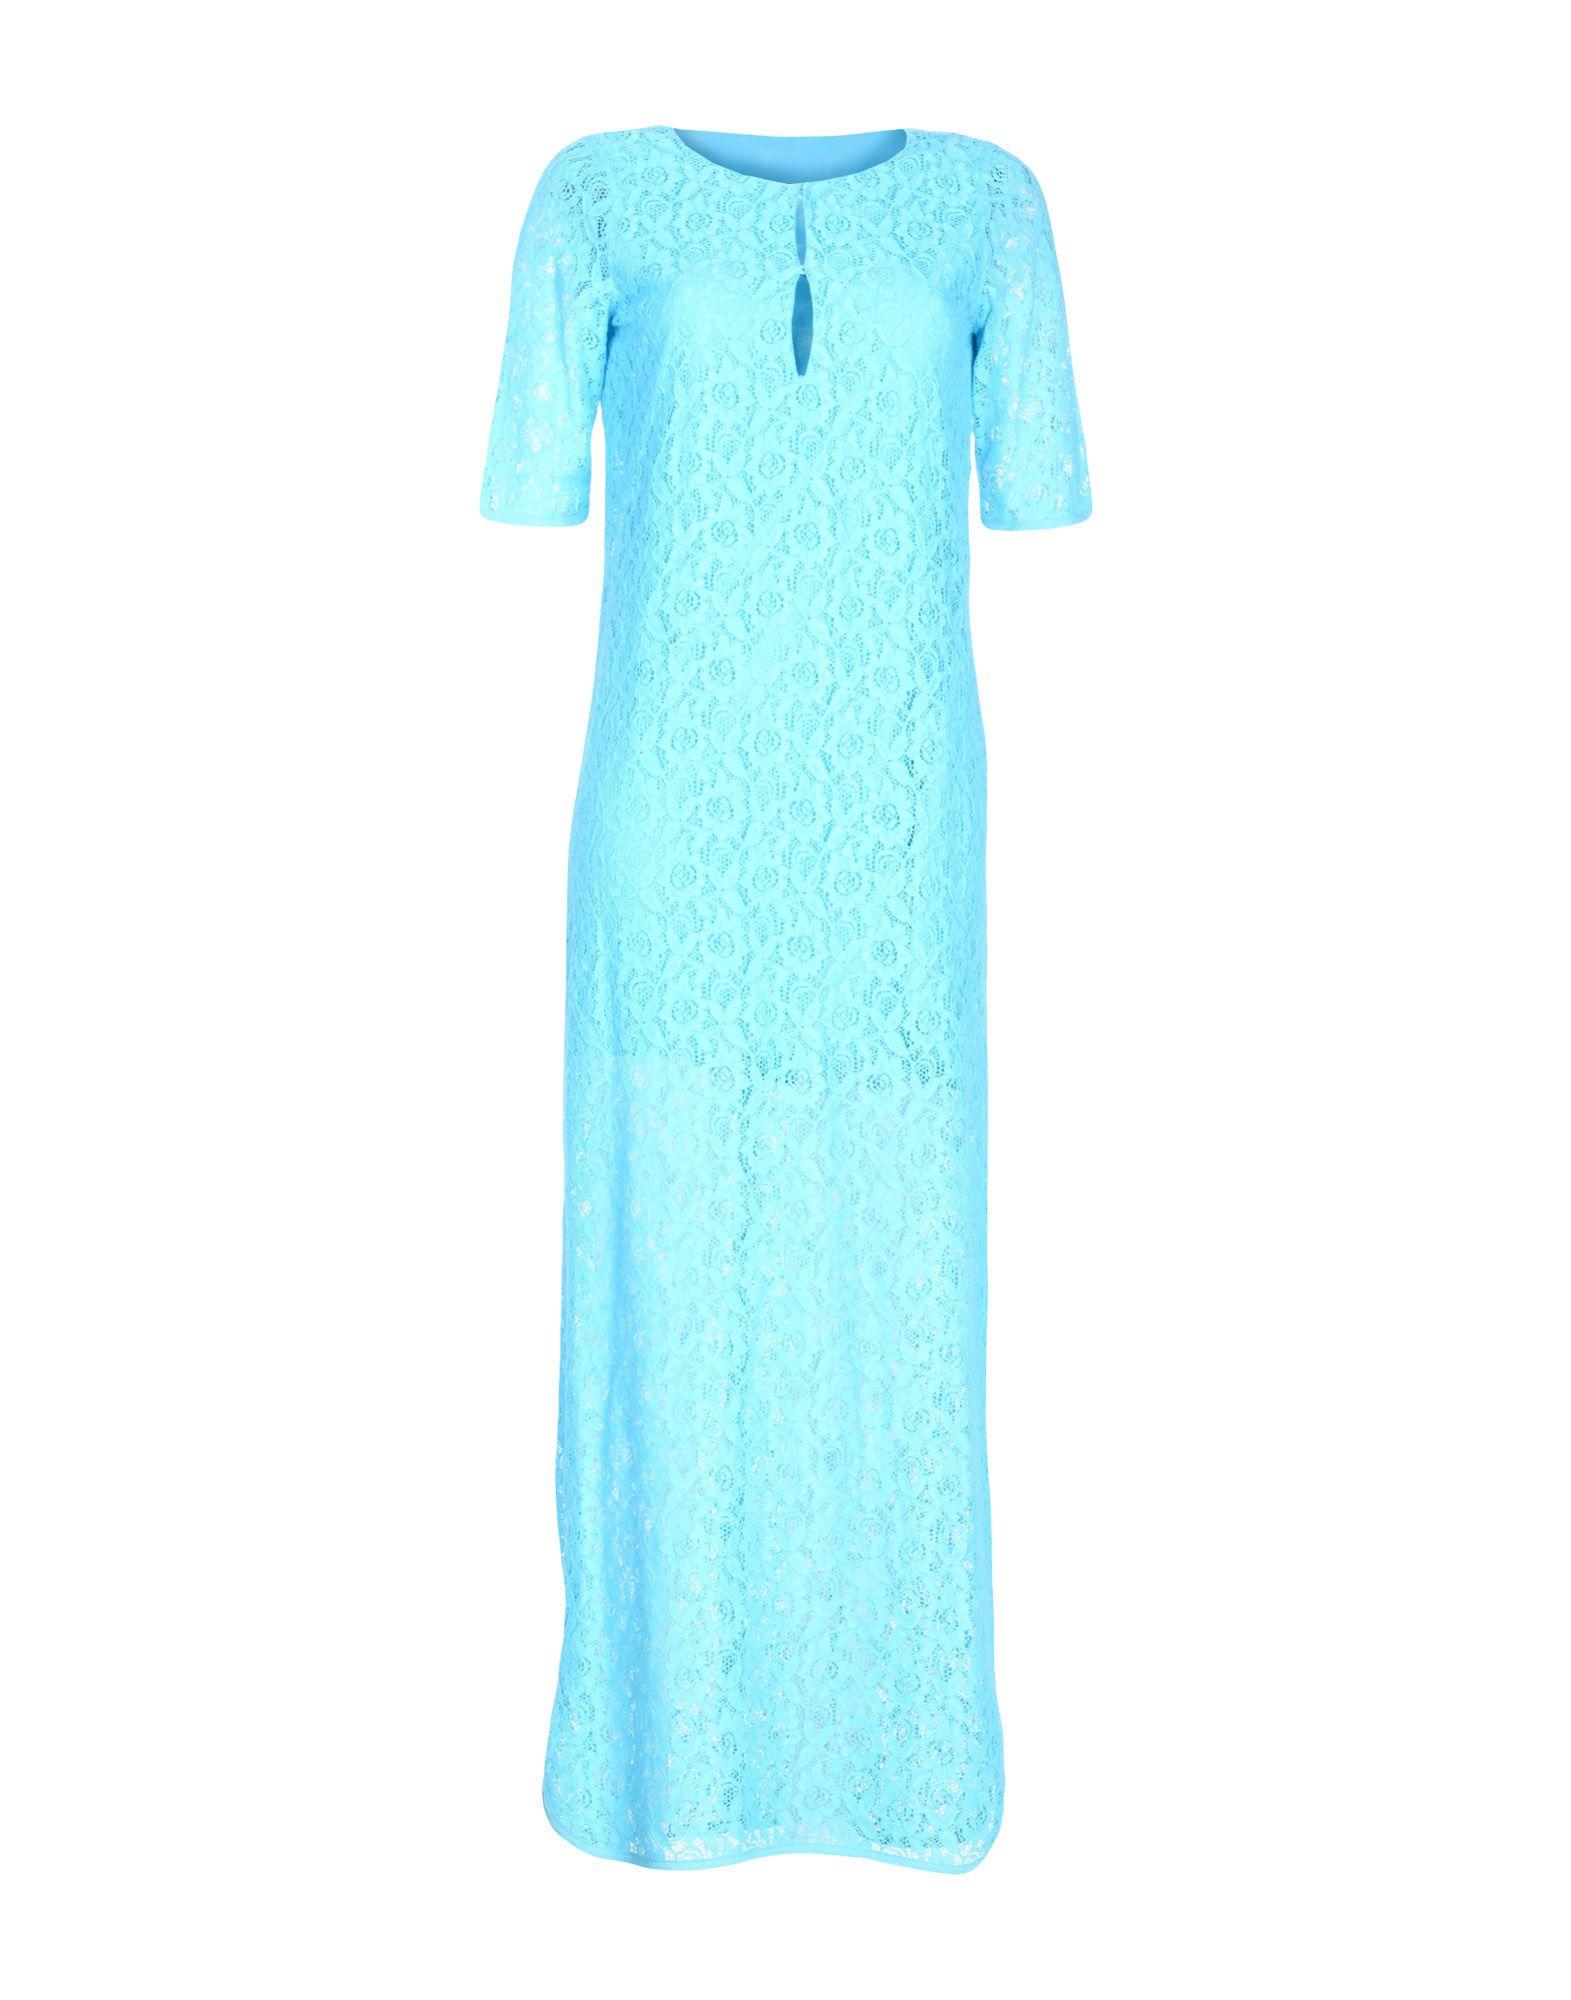 VIOLET ATOS LOMBARDINI Длинное платье atos lombardini per l nde le palais длинное платье